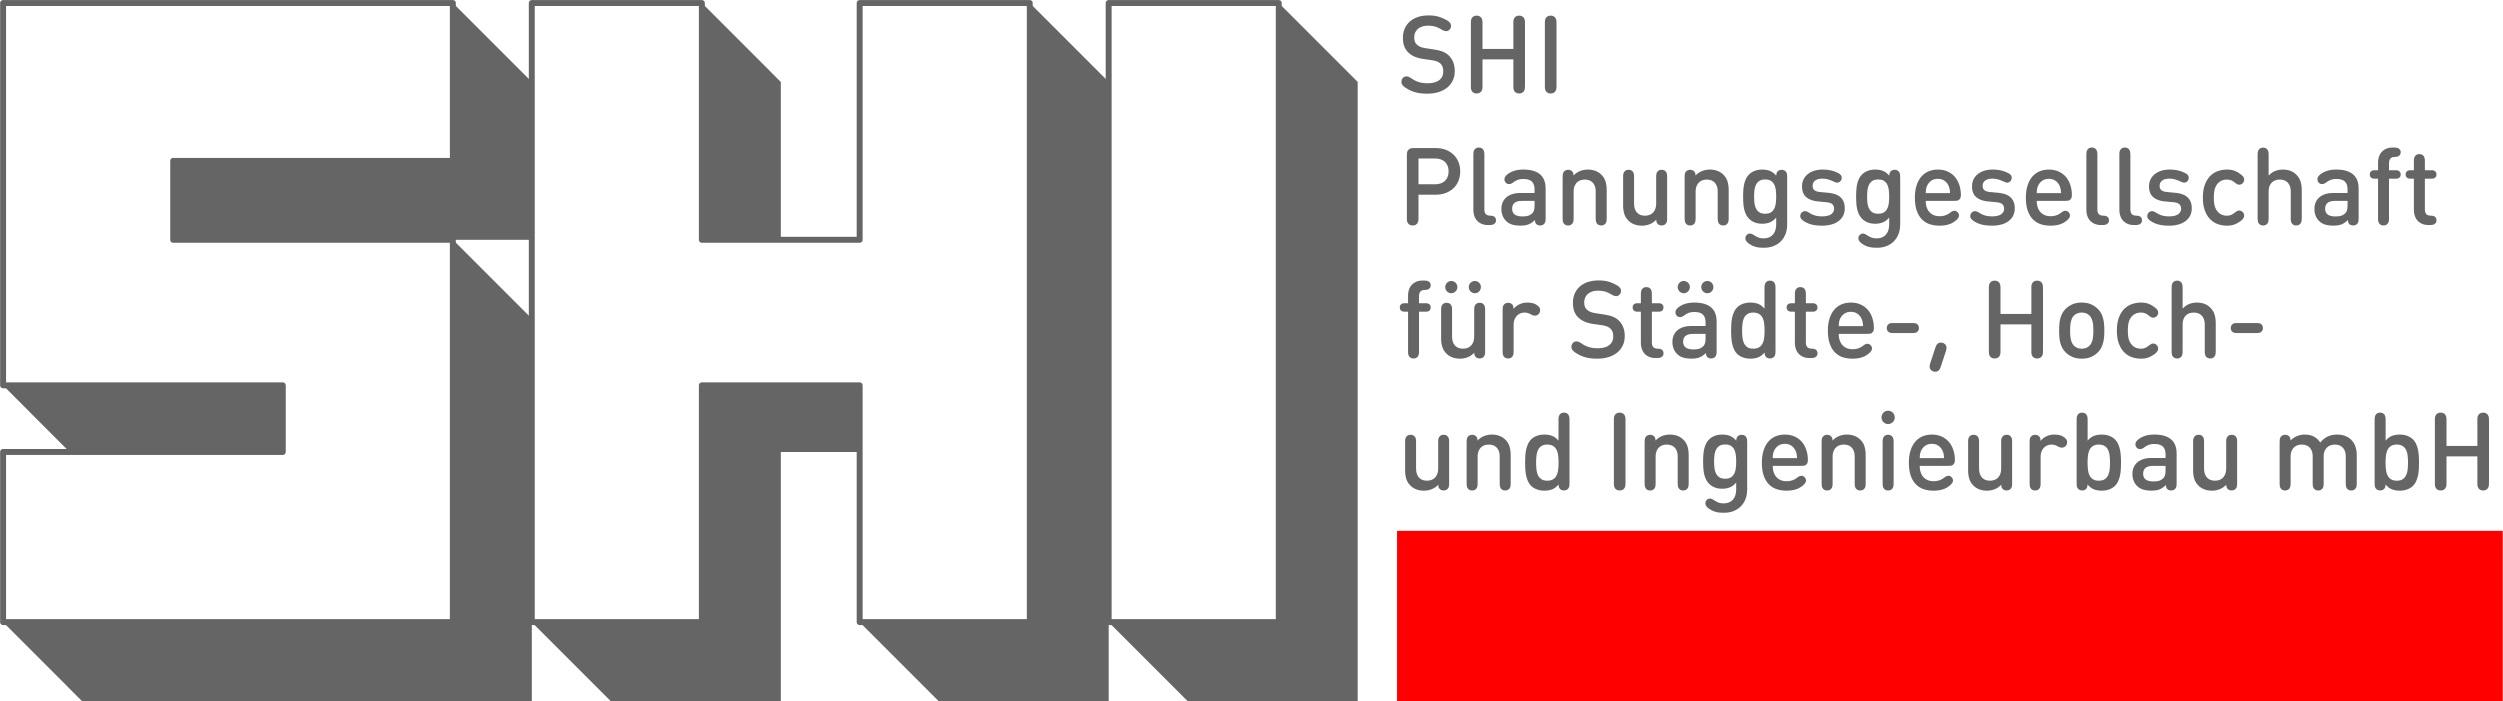 SHI Planungsgesellschaft mbH